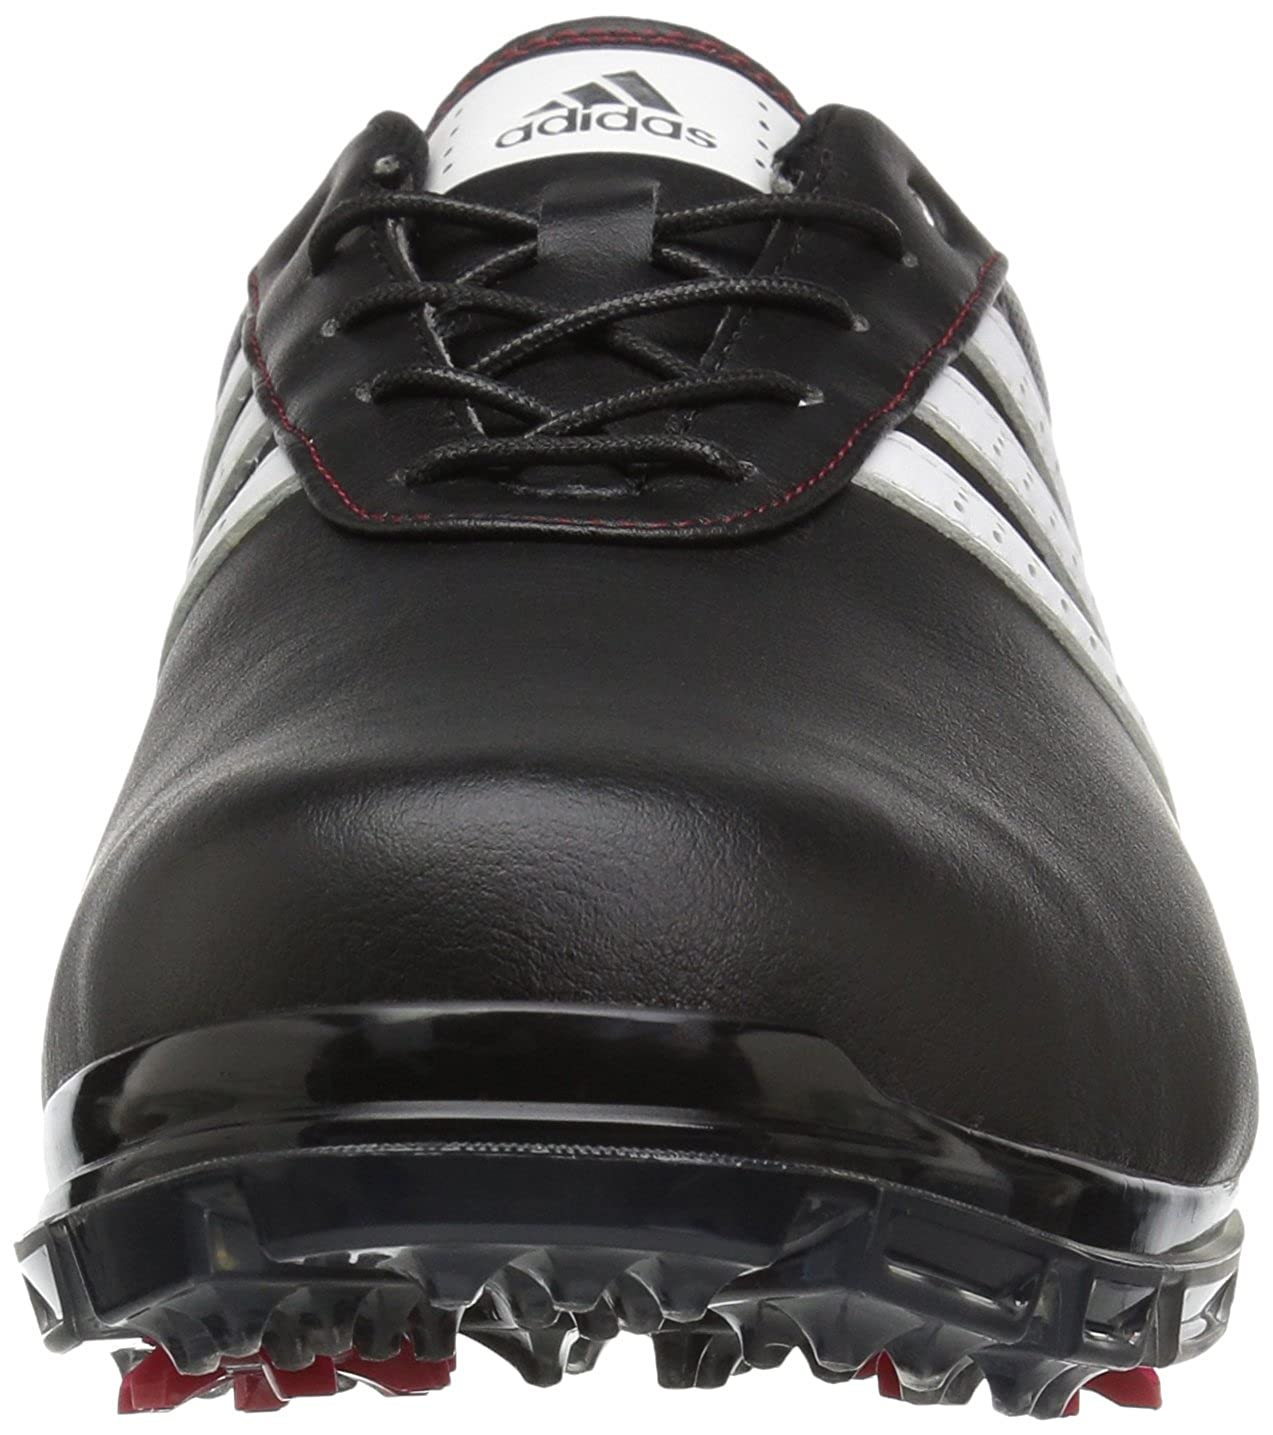 quality design 8f055 dd540 Amazon.com  Adidas Mens Adipure Flex Golf Shoe  Golf